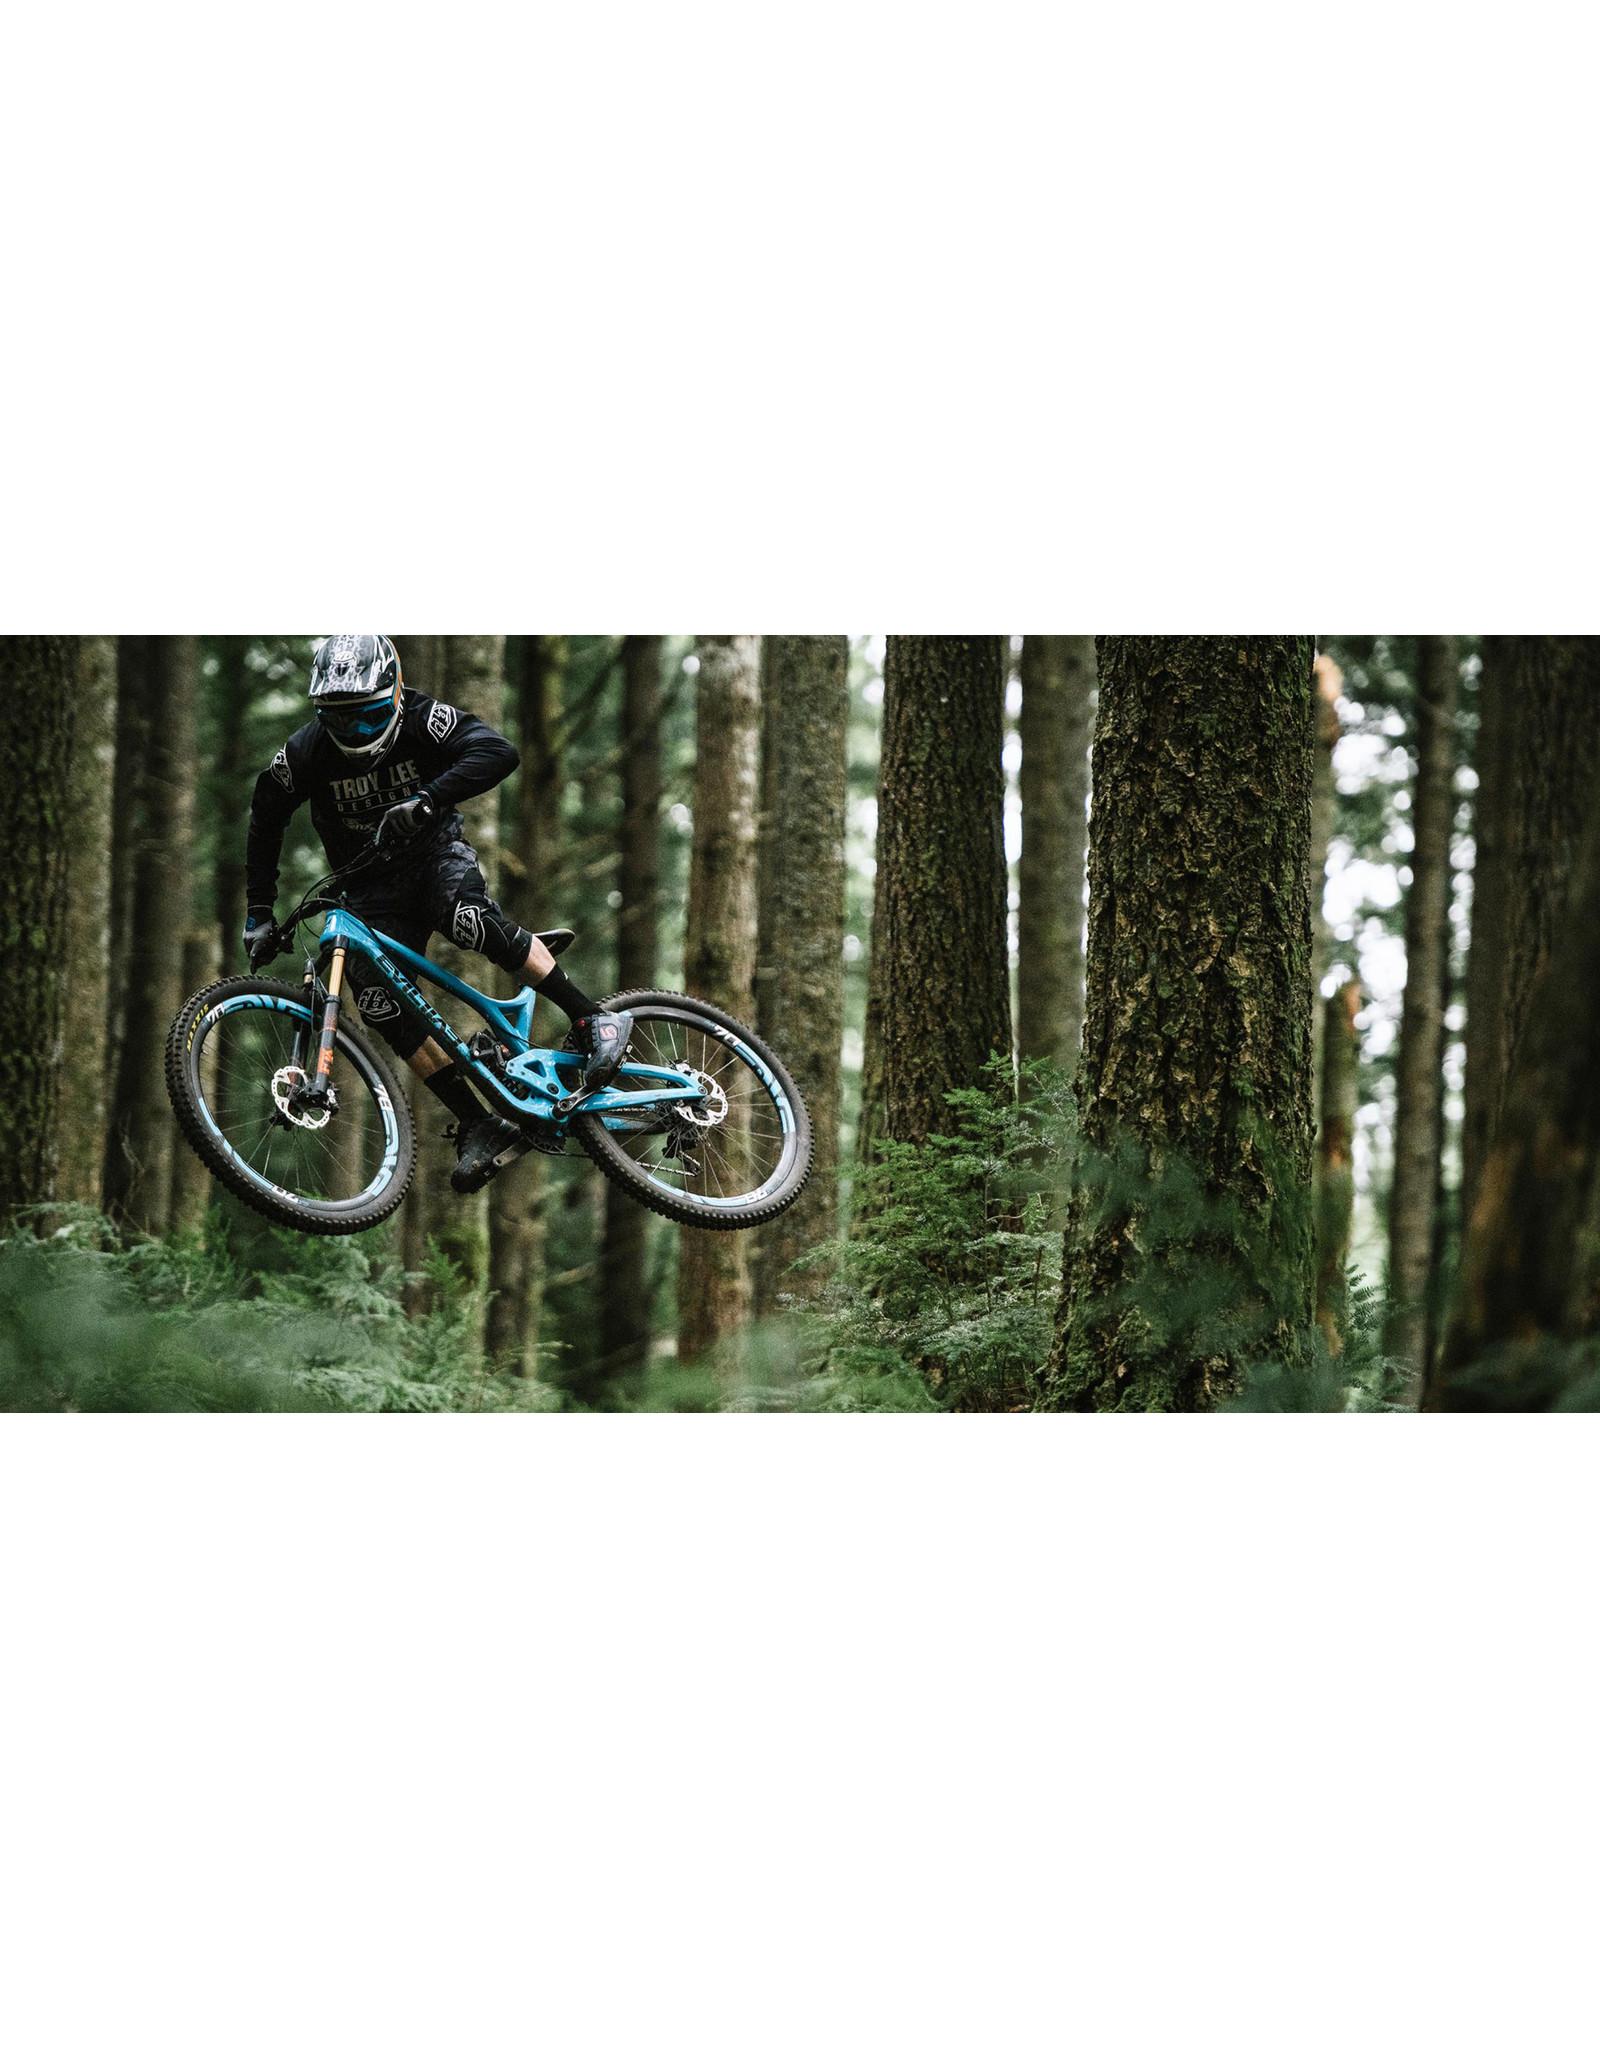 Advanced: Jumps and Drops